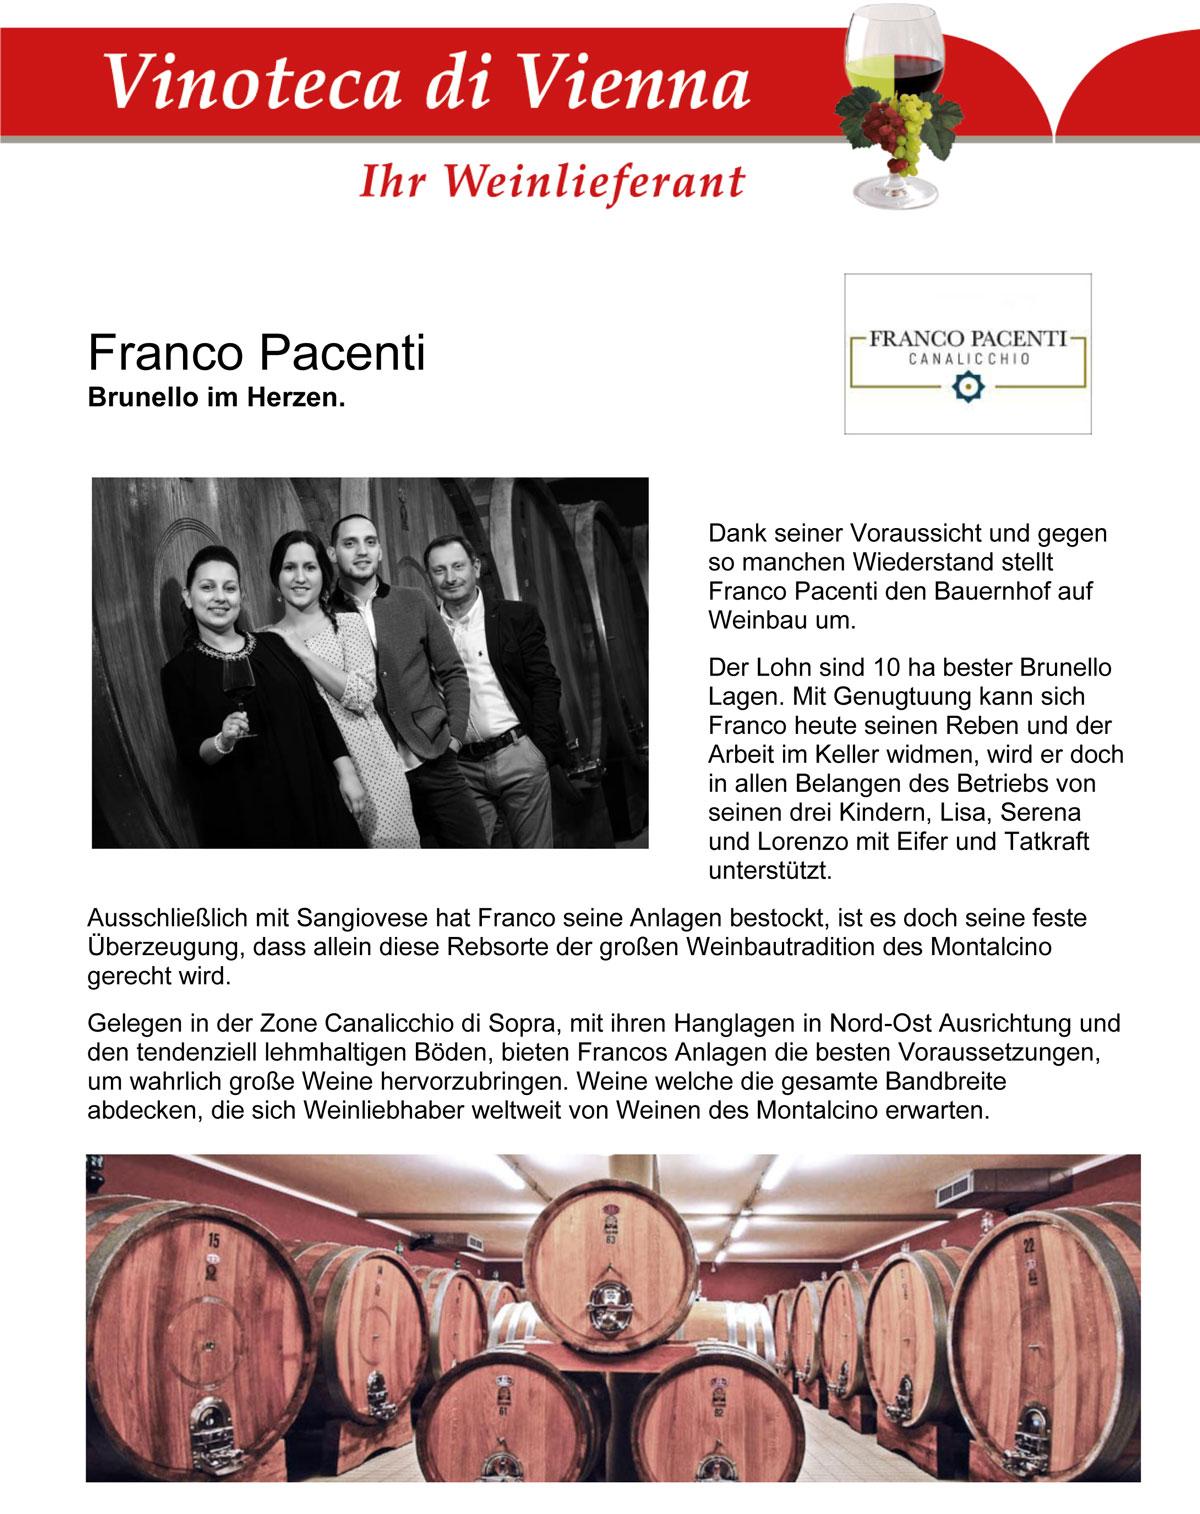 Franco Pacenti, Brunello im Herzen.